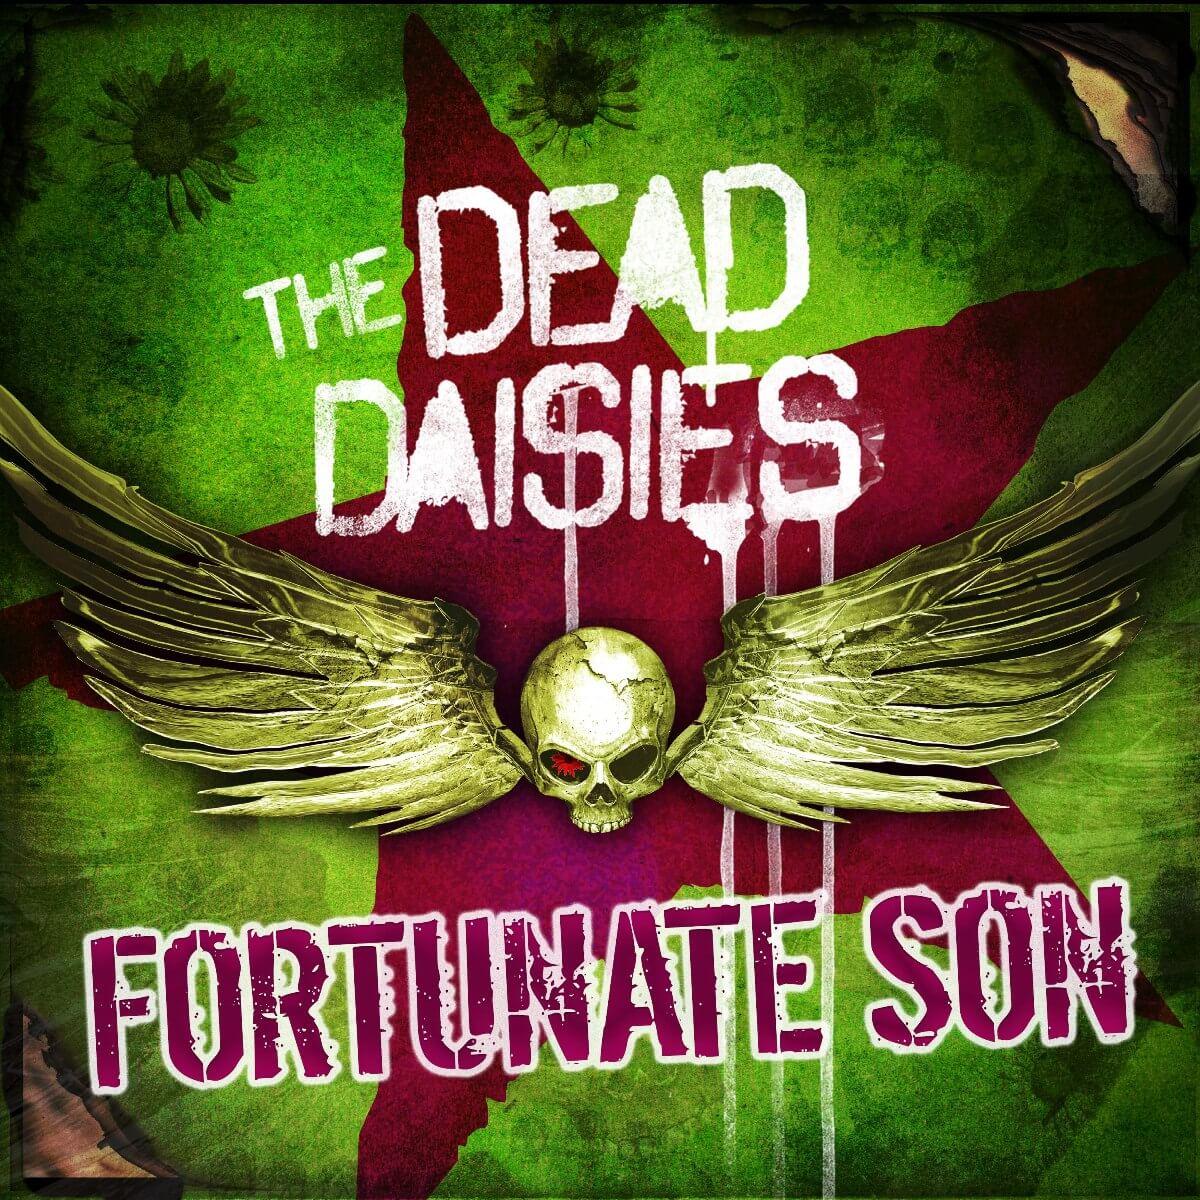 Fortunate Son (Spotify Single)